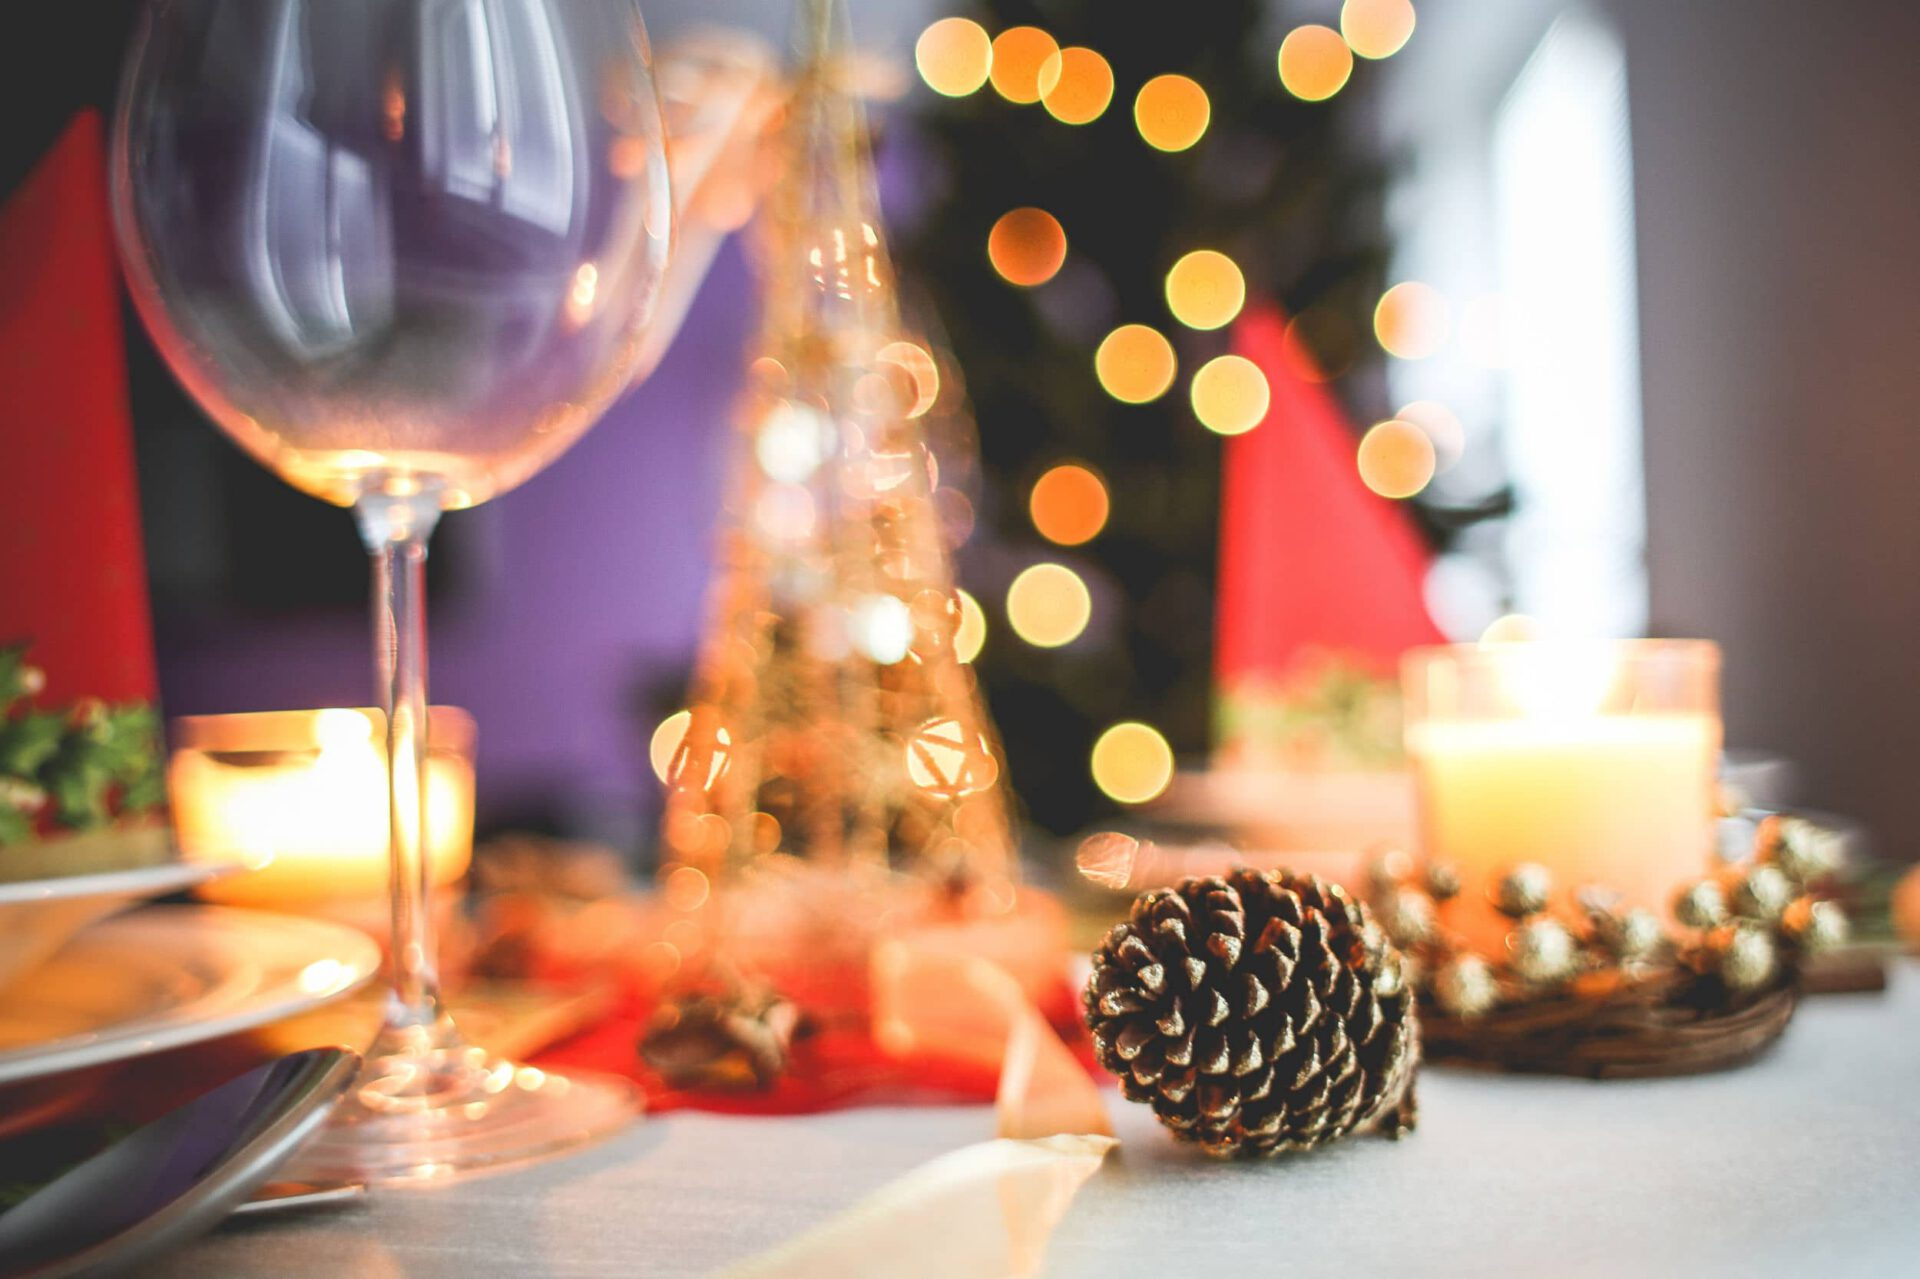 Weihnachtsfeier-all-inclusive-hamburg-delphi-showpalast